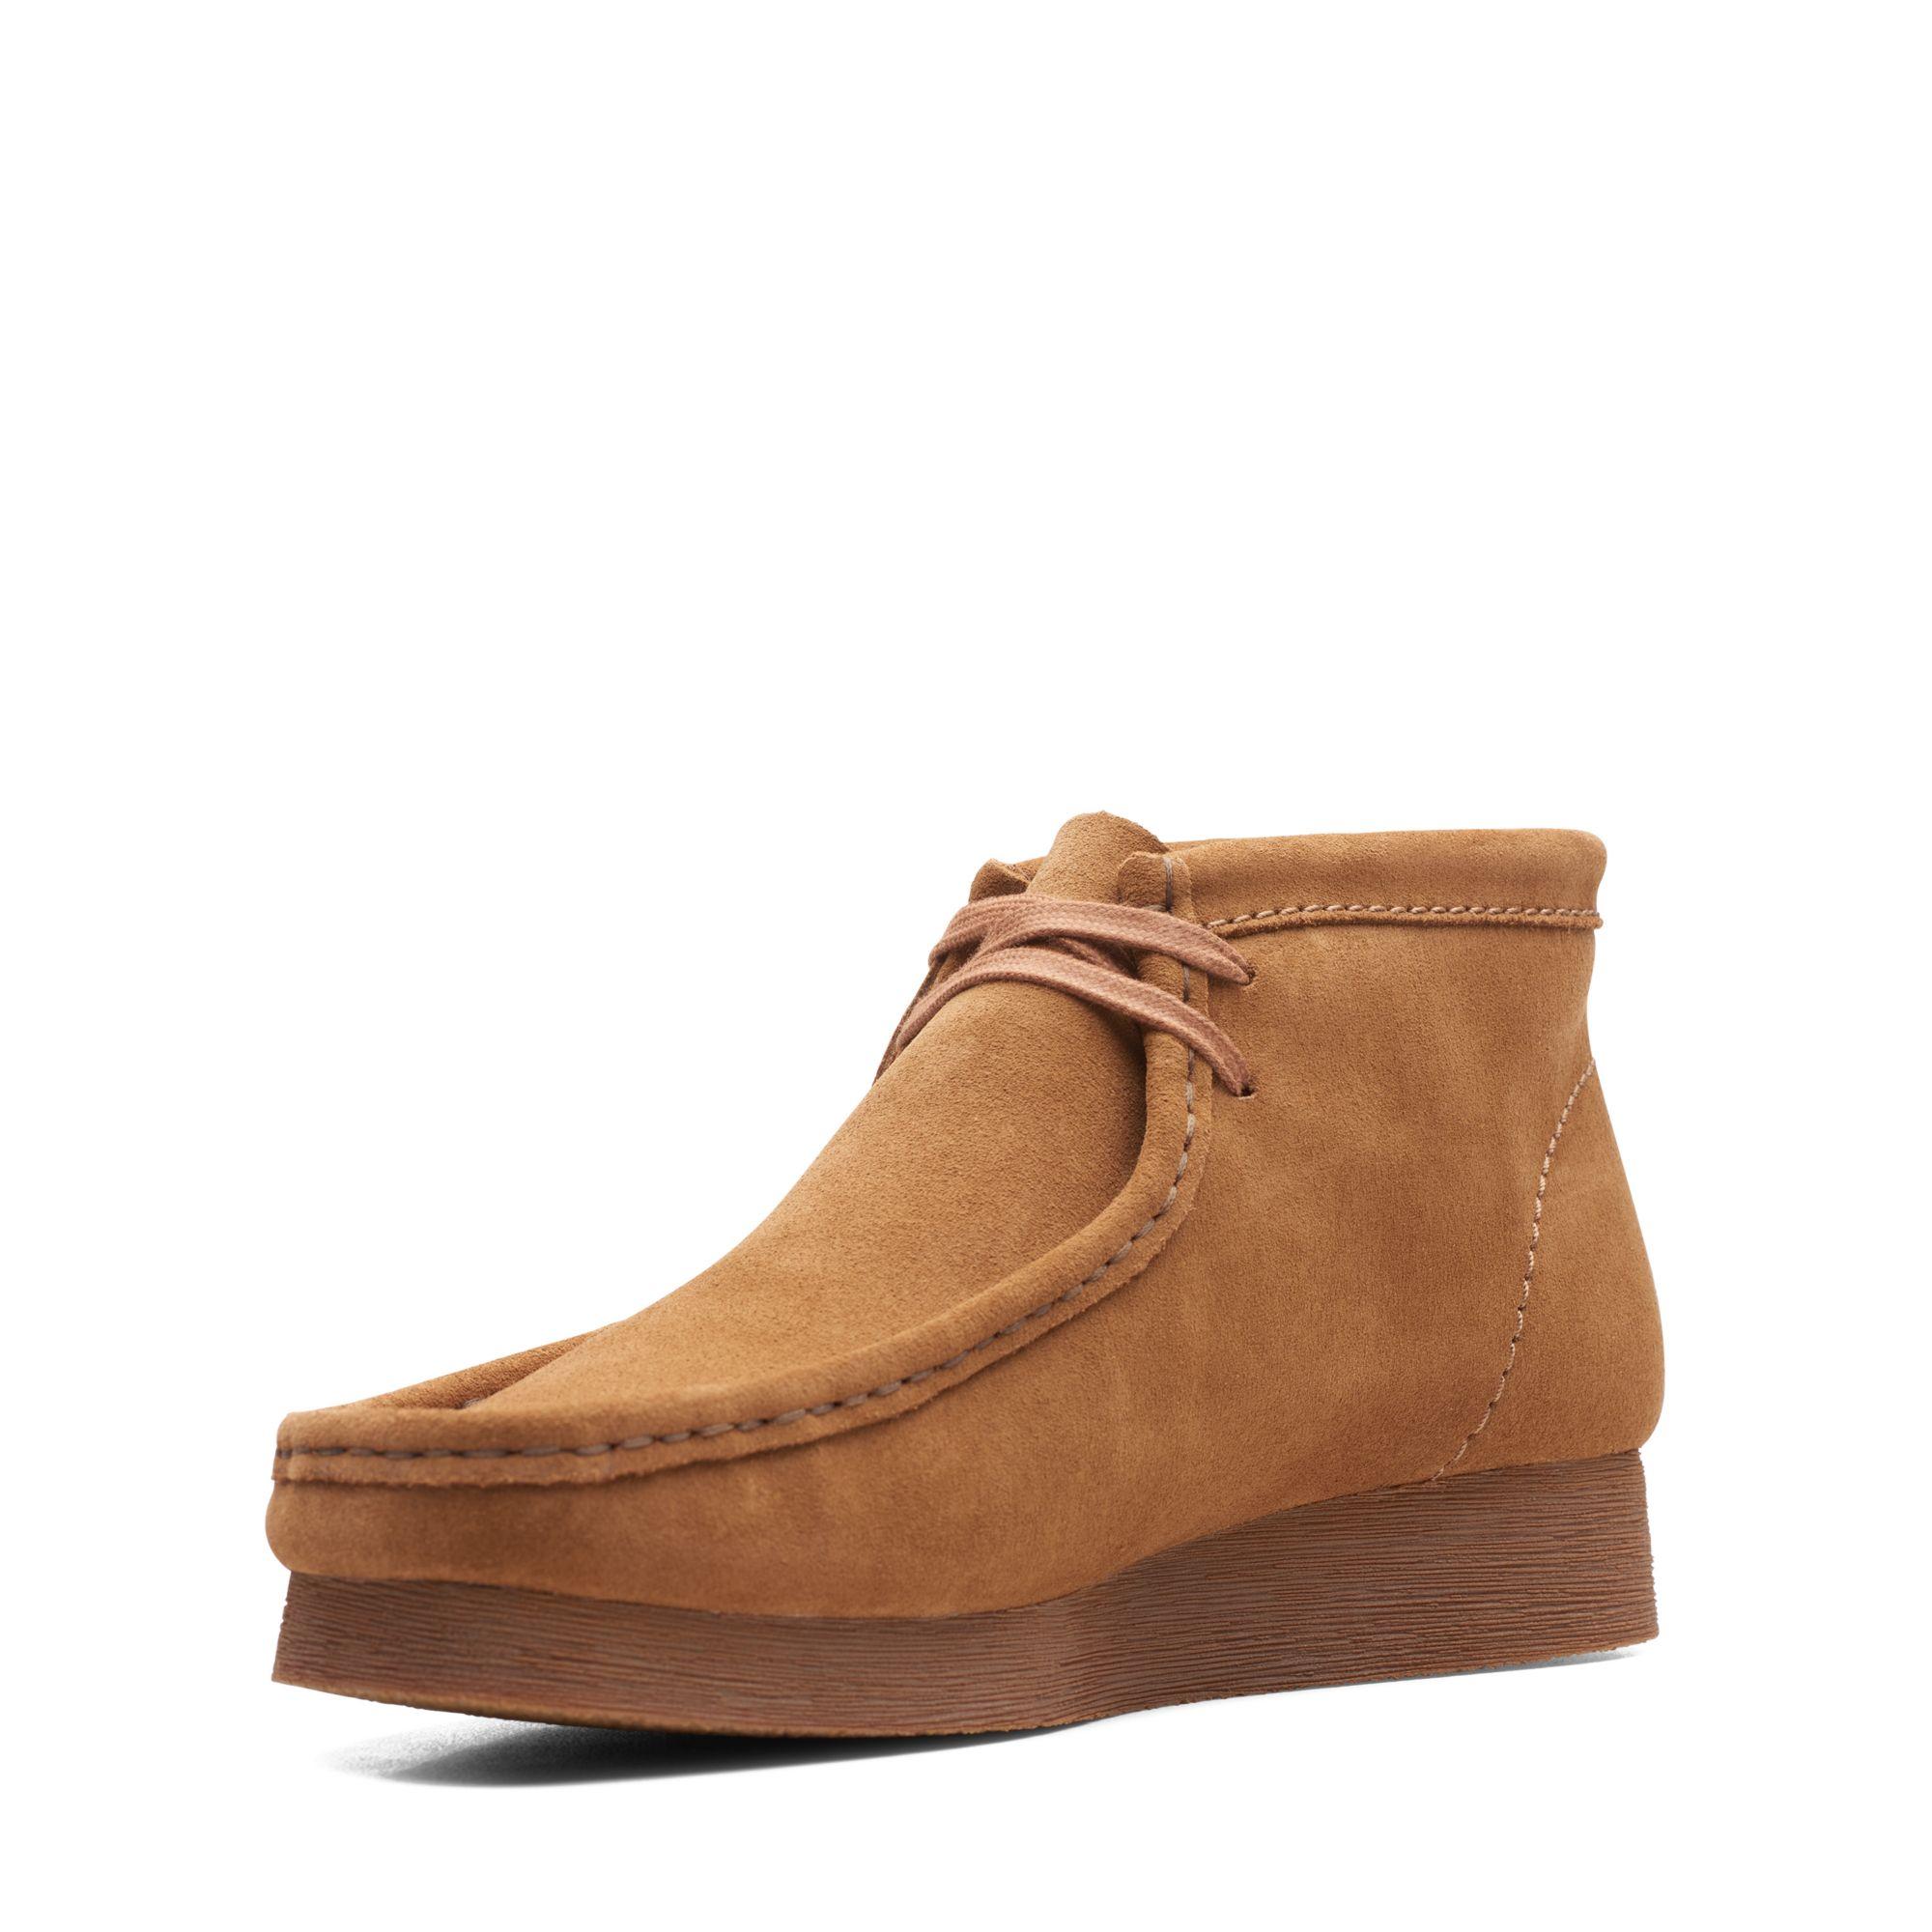 Clarks Wallabee 2 Støvler, Brown Suede, 44